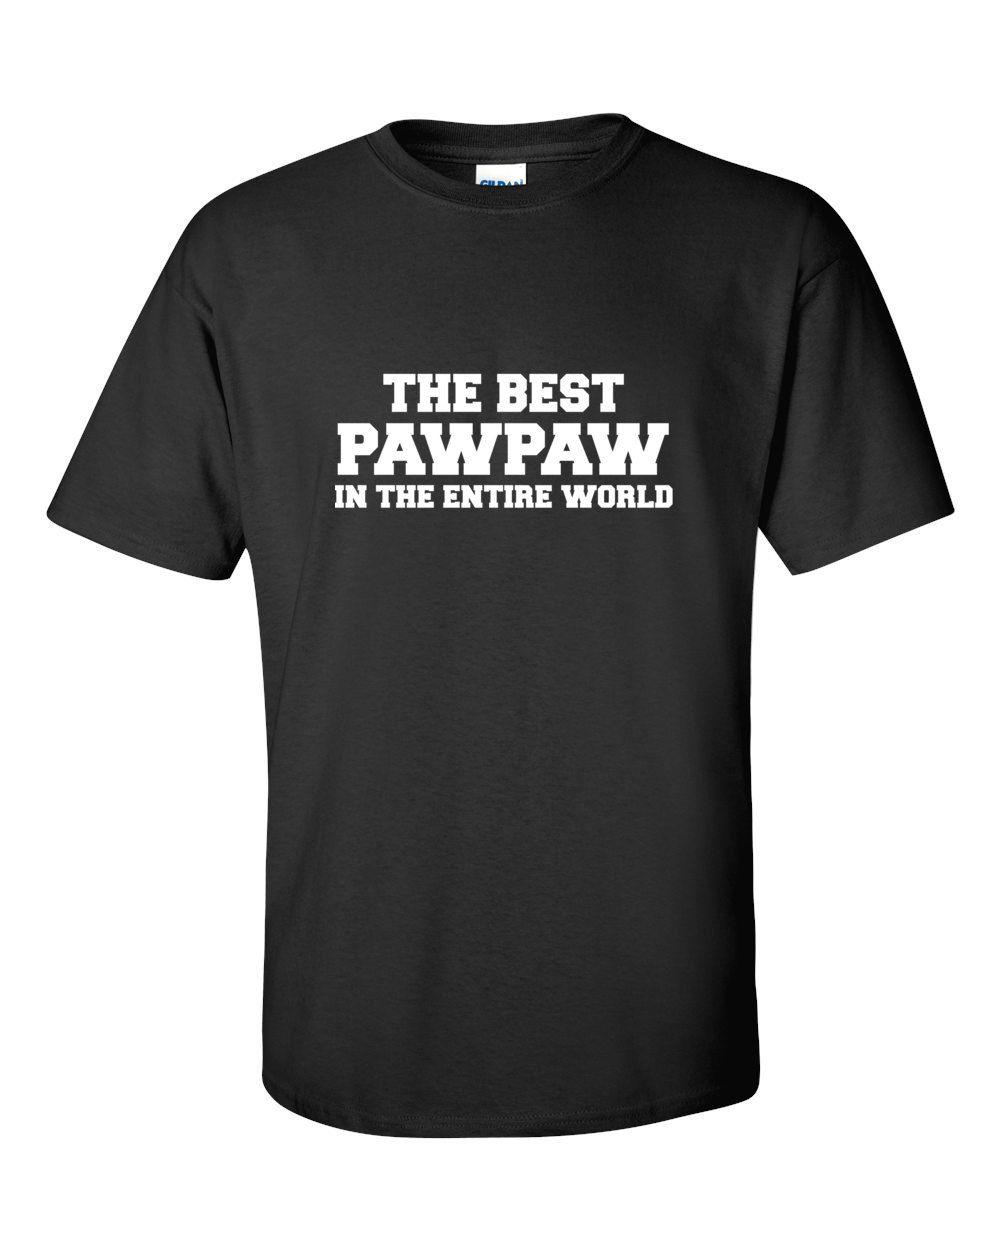 Awesome Papaw Shirt New Grandpa Shirt Best Papaw Tshirt Papaw Shirt Gift  67